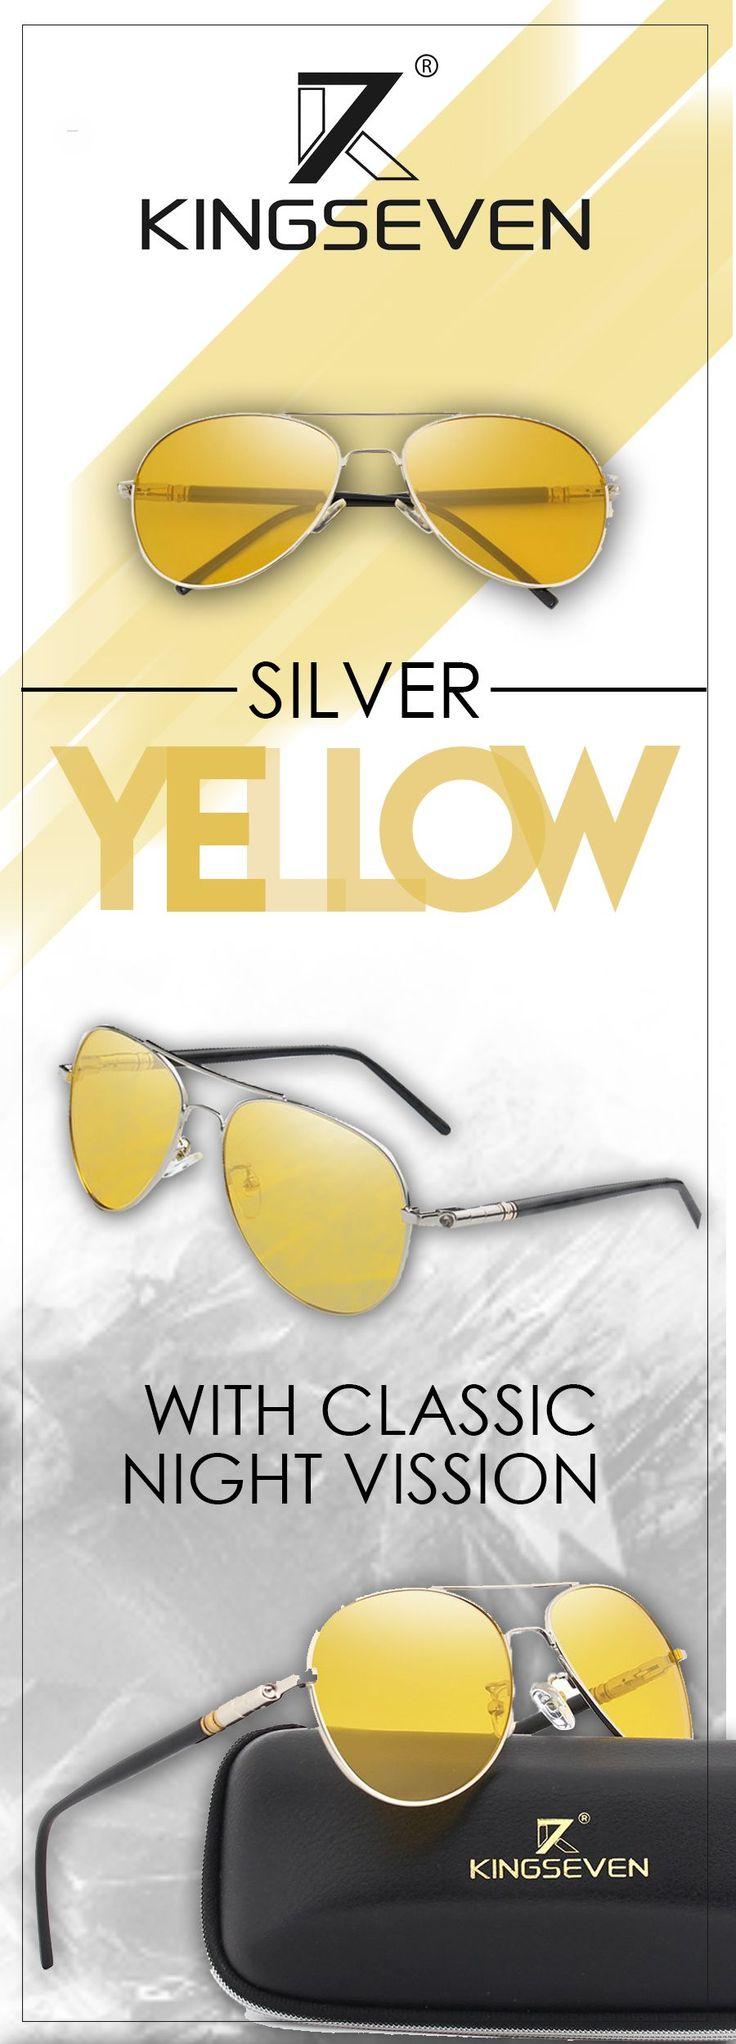 Men's polarized night driving sunglasses - Kingseven designer sunglasses - Men's top brand fashion style affordable accessories #sunglasses #menssunglasses #affordable #sunglassesformen #mensaccessoriessunglasses